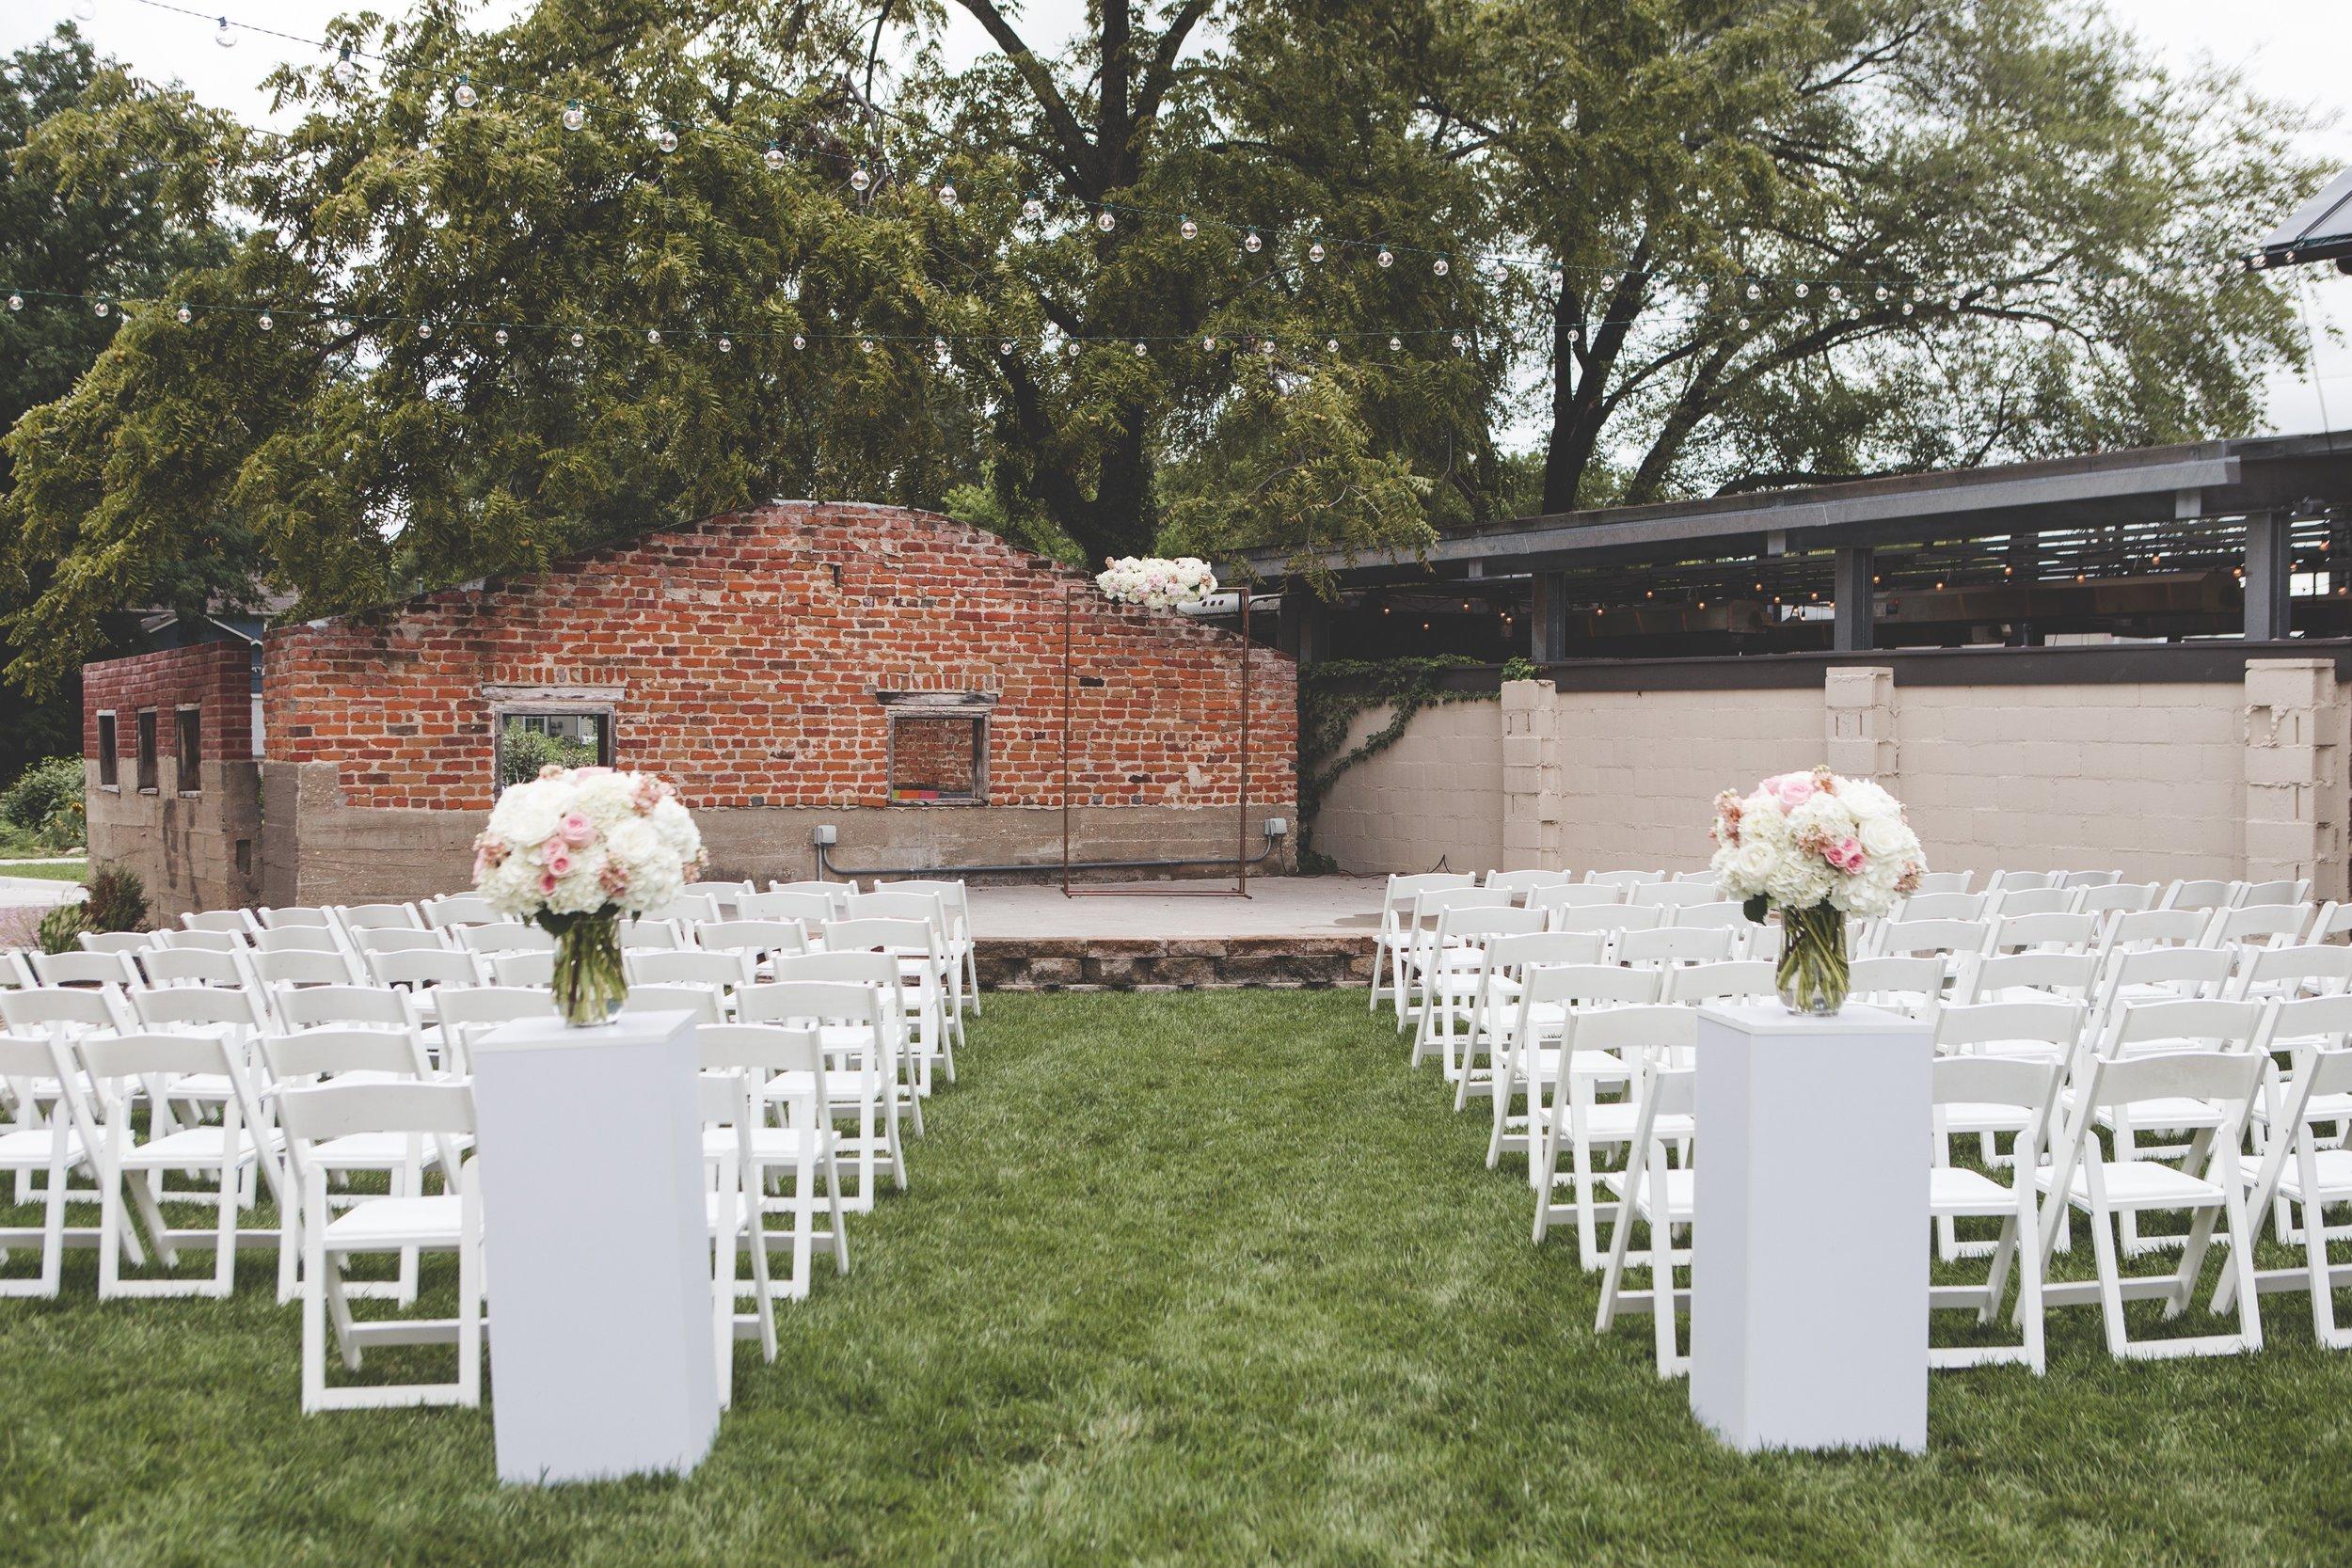 cider-gallery-lawrence-ks-wedding-photographer-jason-domingues-photography-lindsey-paul-0154.jpg